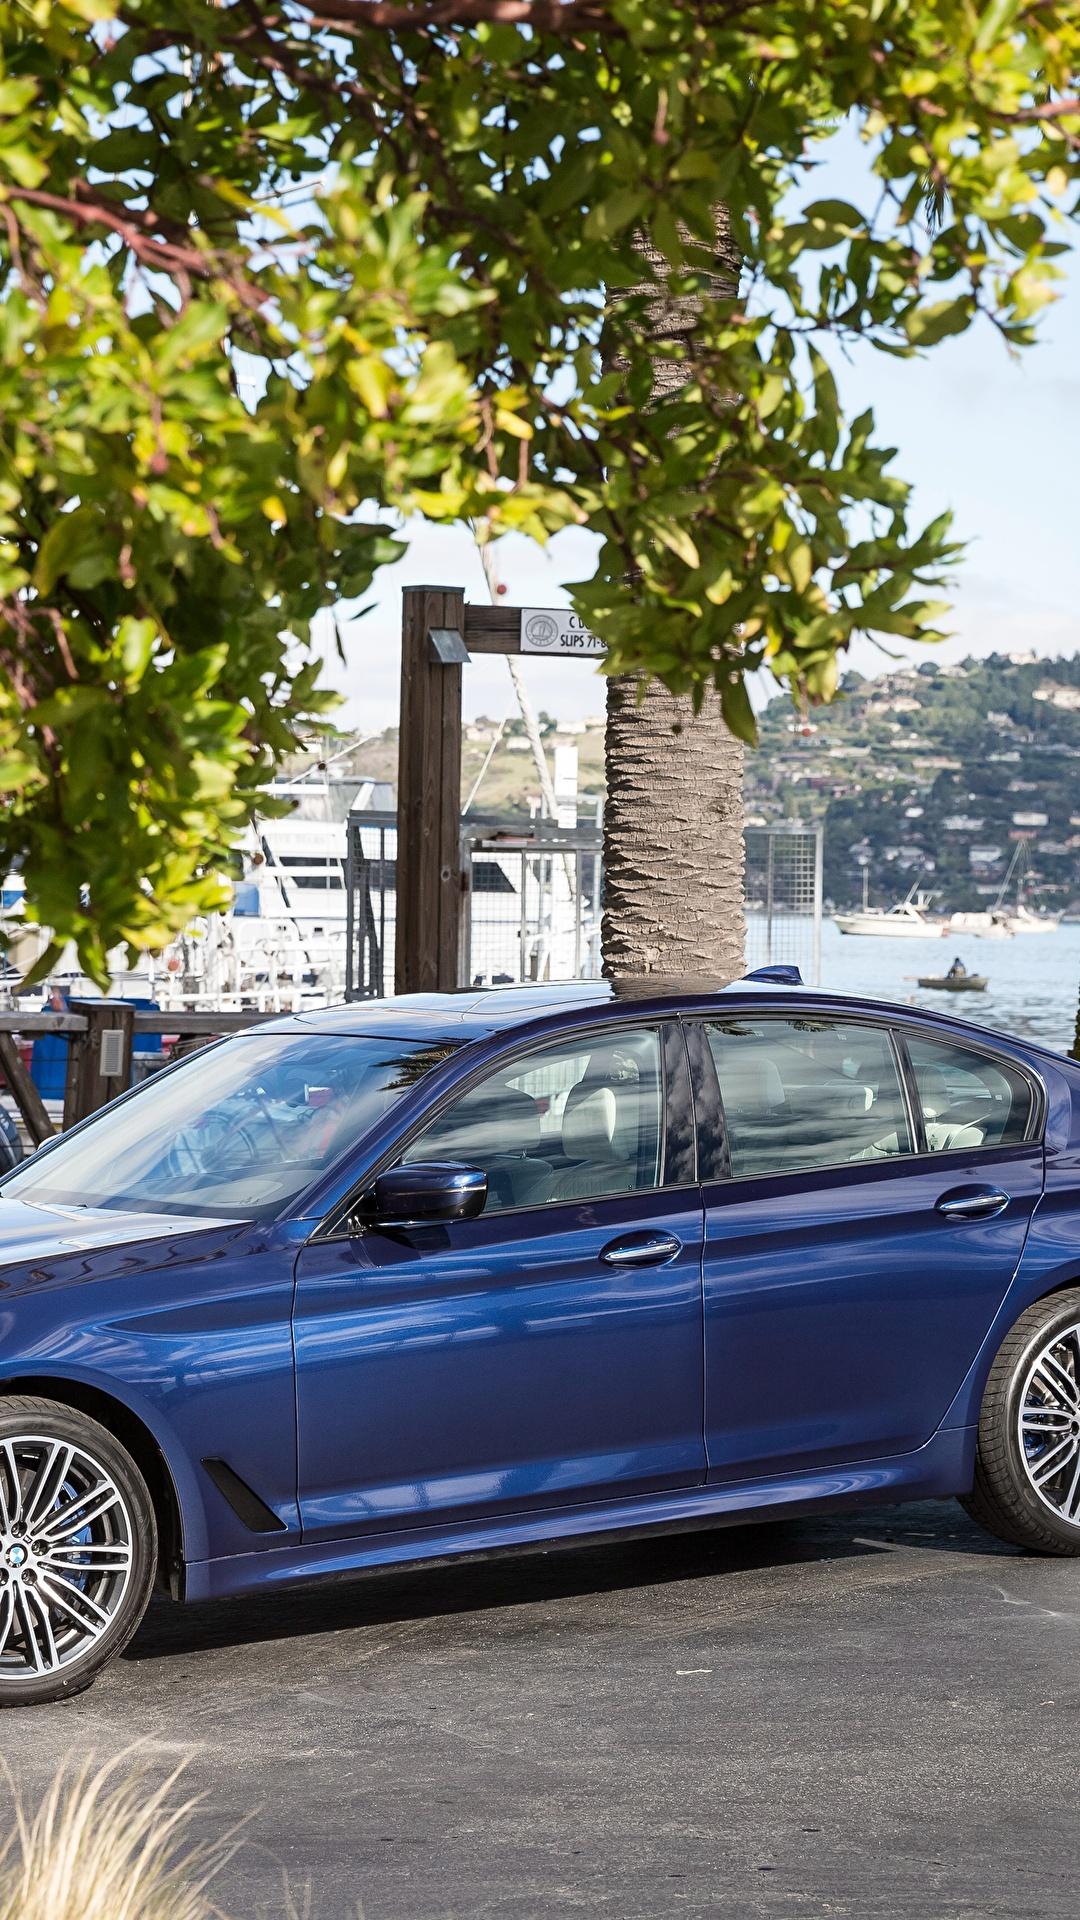 Фото BMW 2018 540i Sedan M Sport Синий Металлик Автомобили 1080x1920 БМВ синих синие синяя Авто Машины